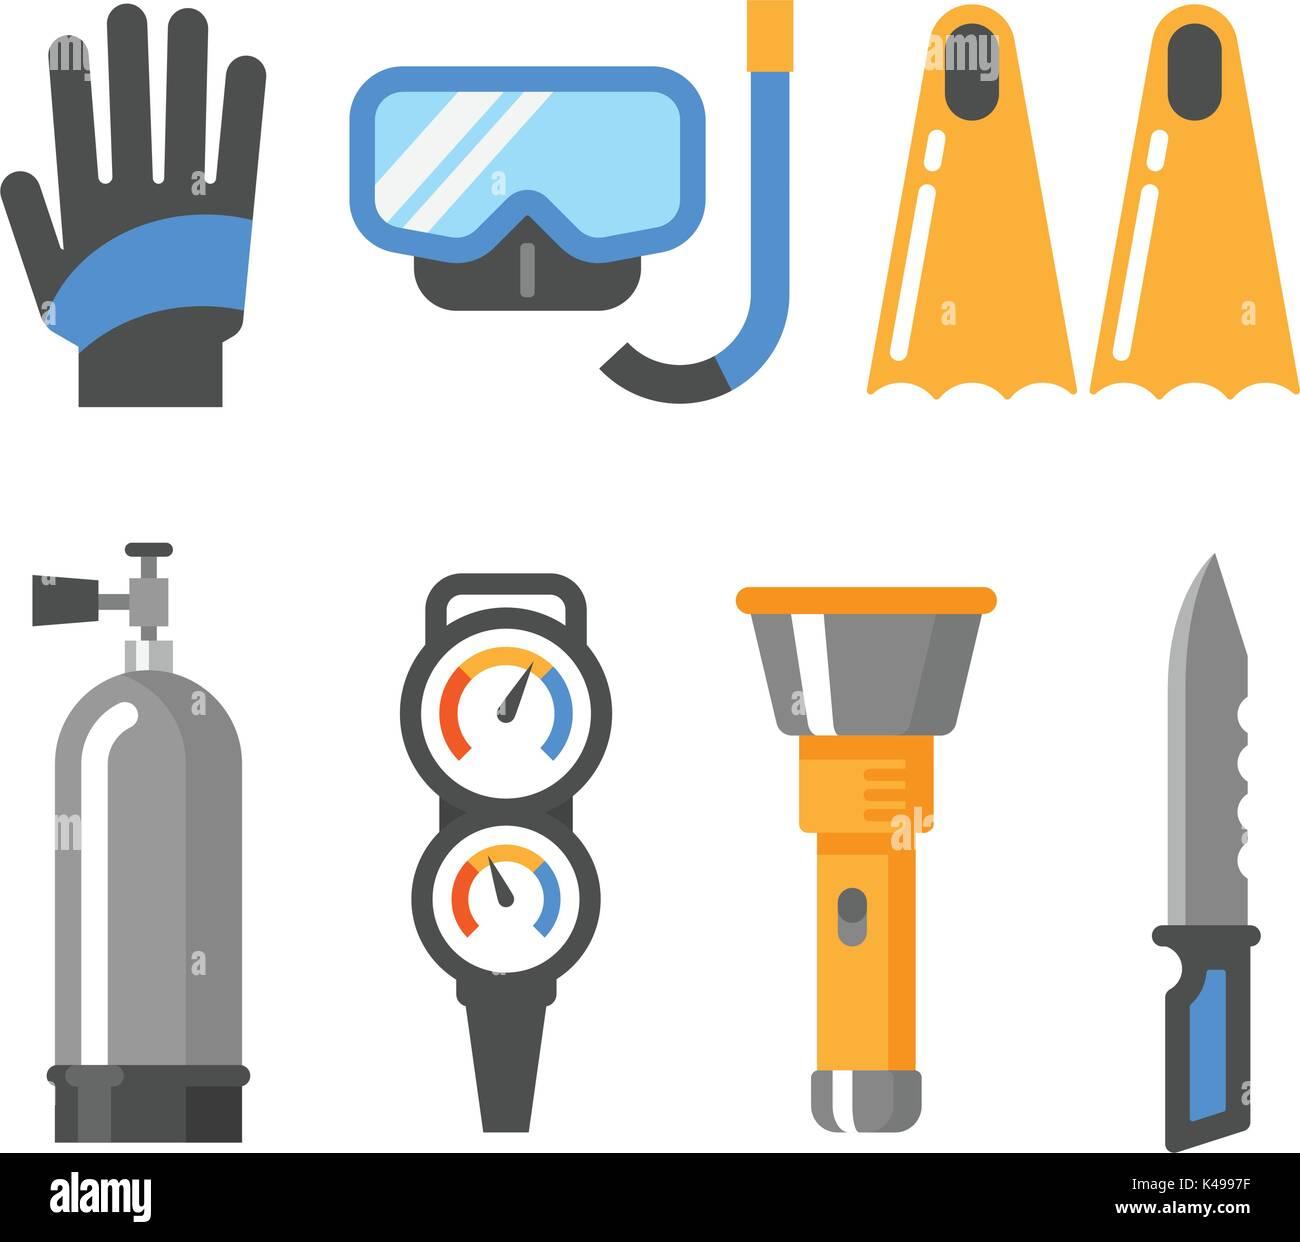 Scuba diving gear flat icon set. Gloves, mask, snorkel, fins, air tank, pressure gauge, flashlight, knife. - Stock Vector